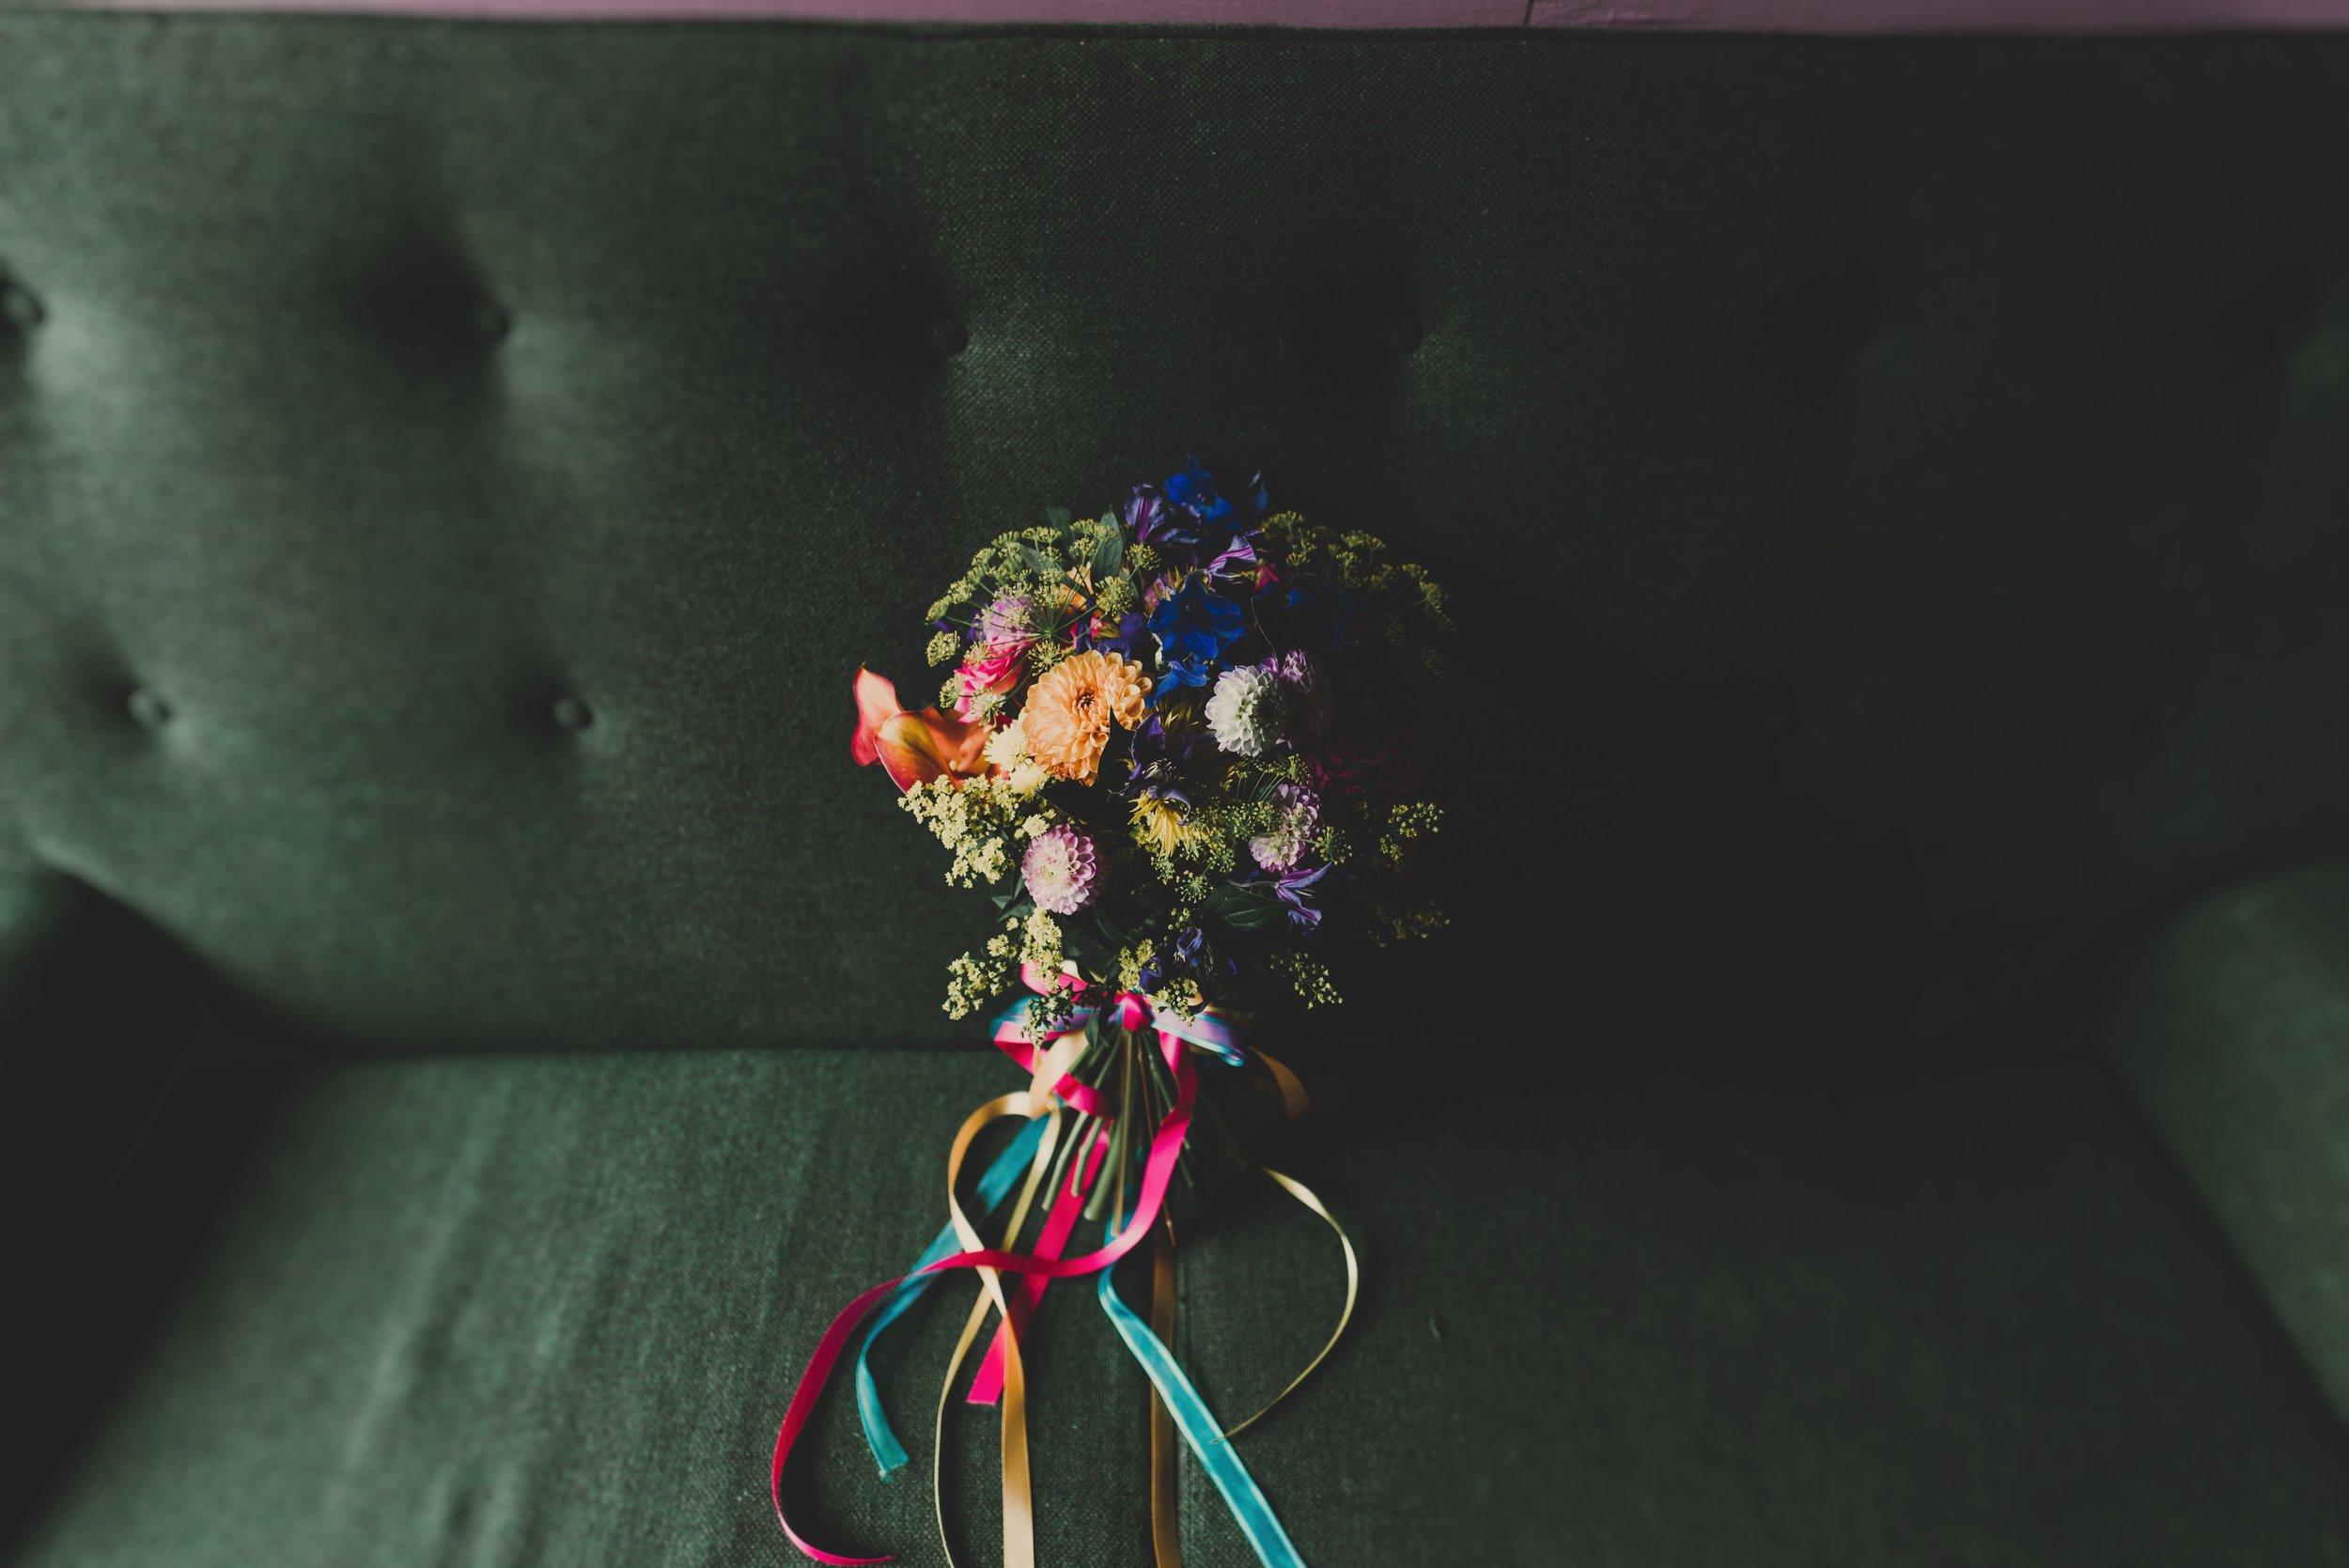 Florist-shop-branding-shoot-chester-north-wales (6).jpg